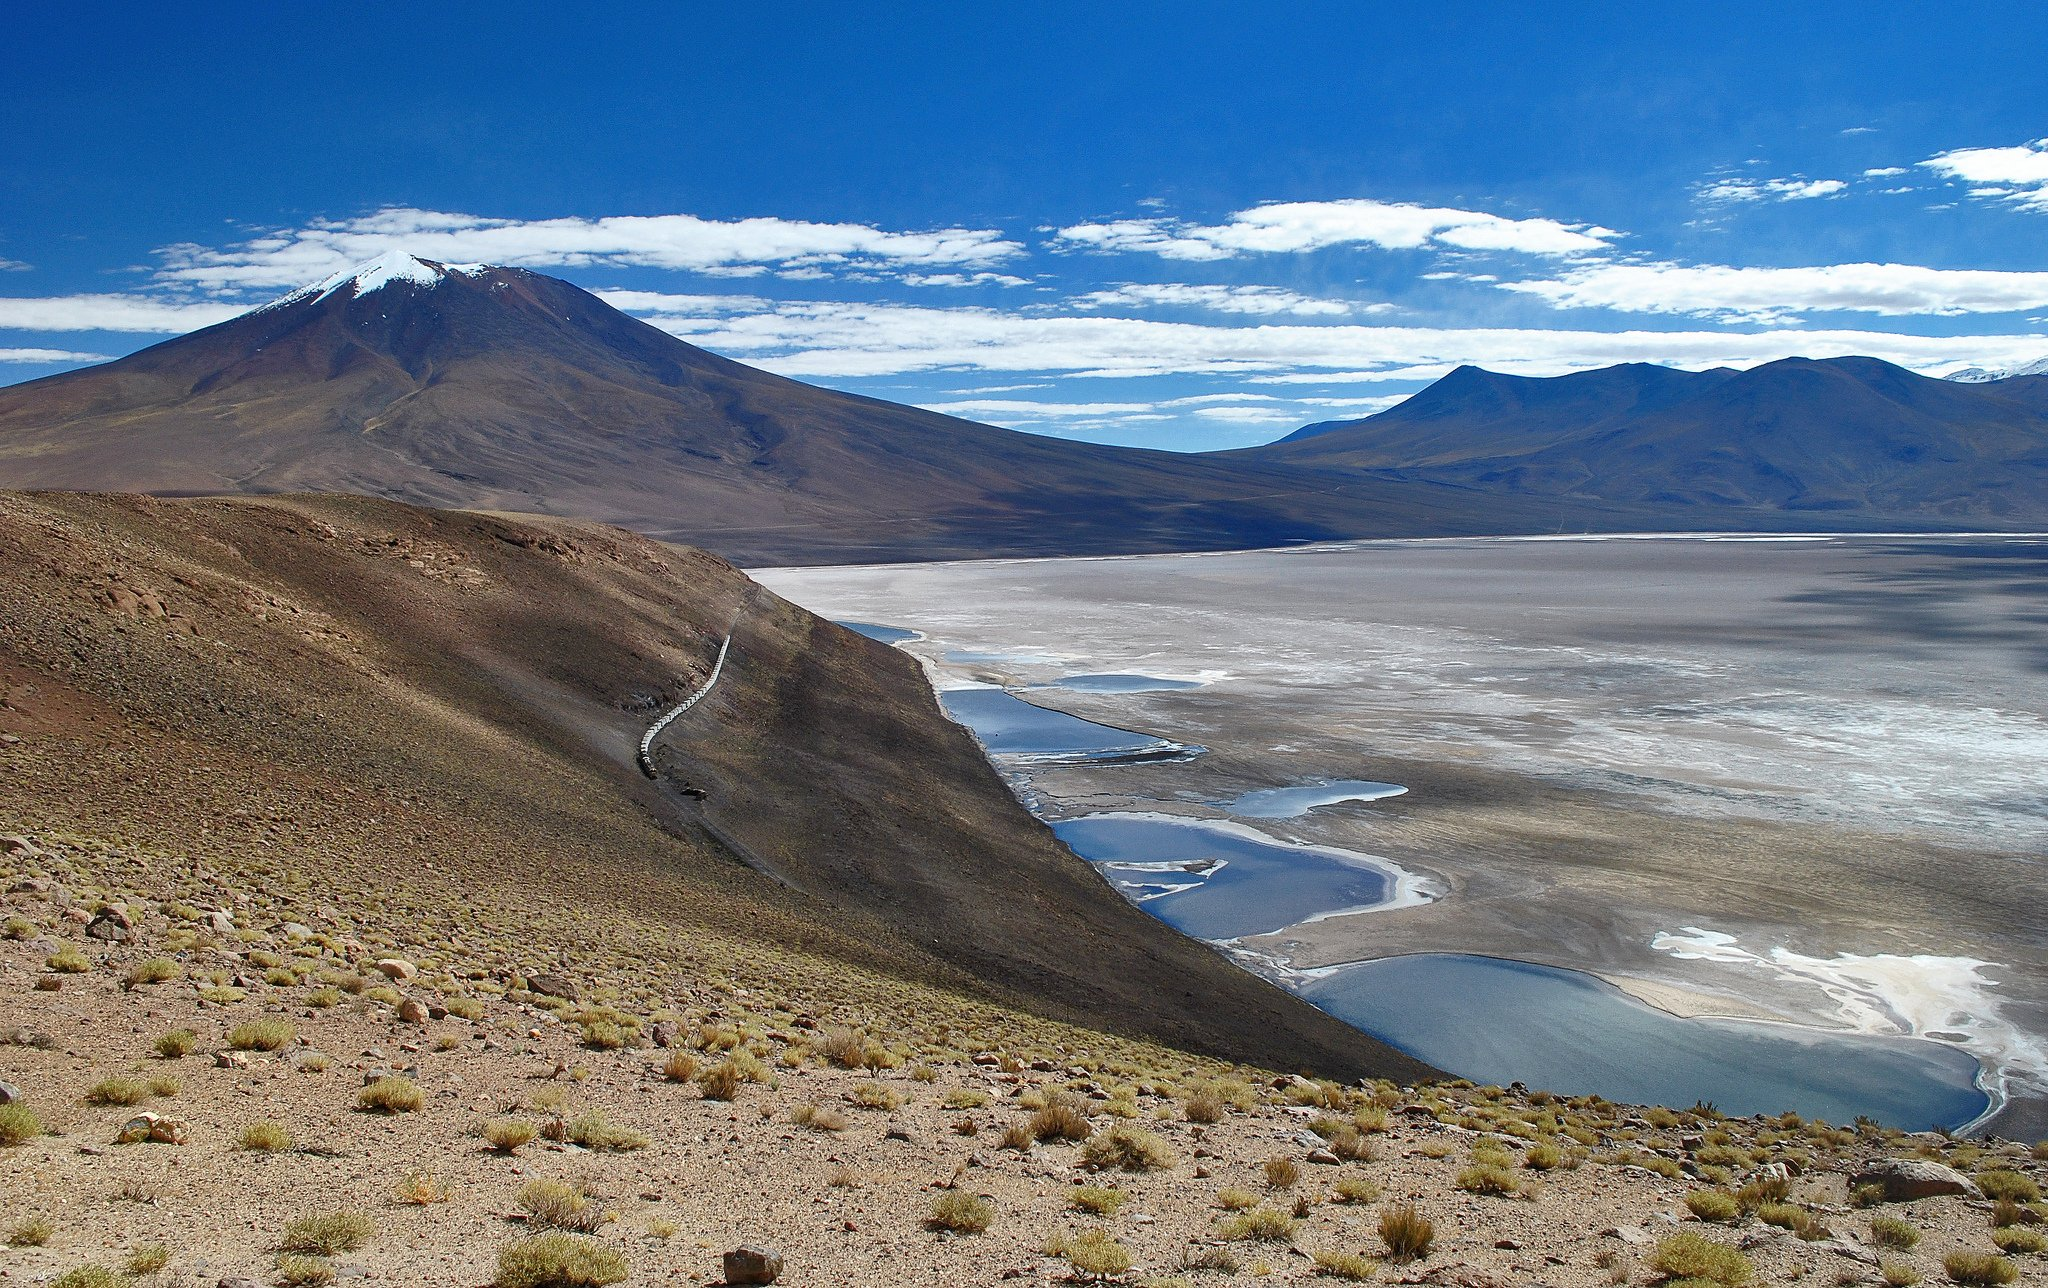 Images Bolivia Salar de Uyuni Altiplano Nature Mountains 2048x1288 2048x1288